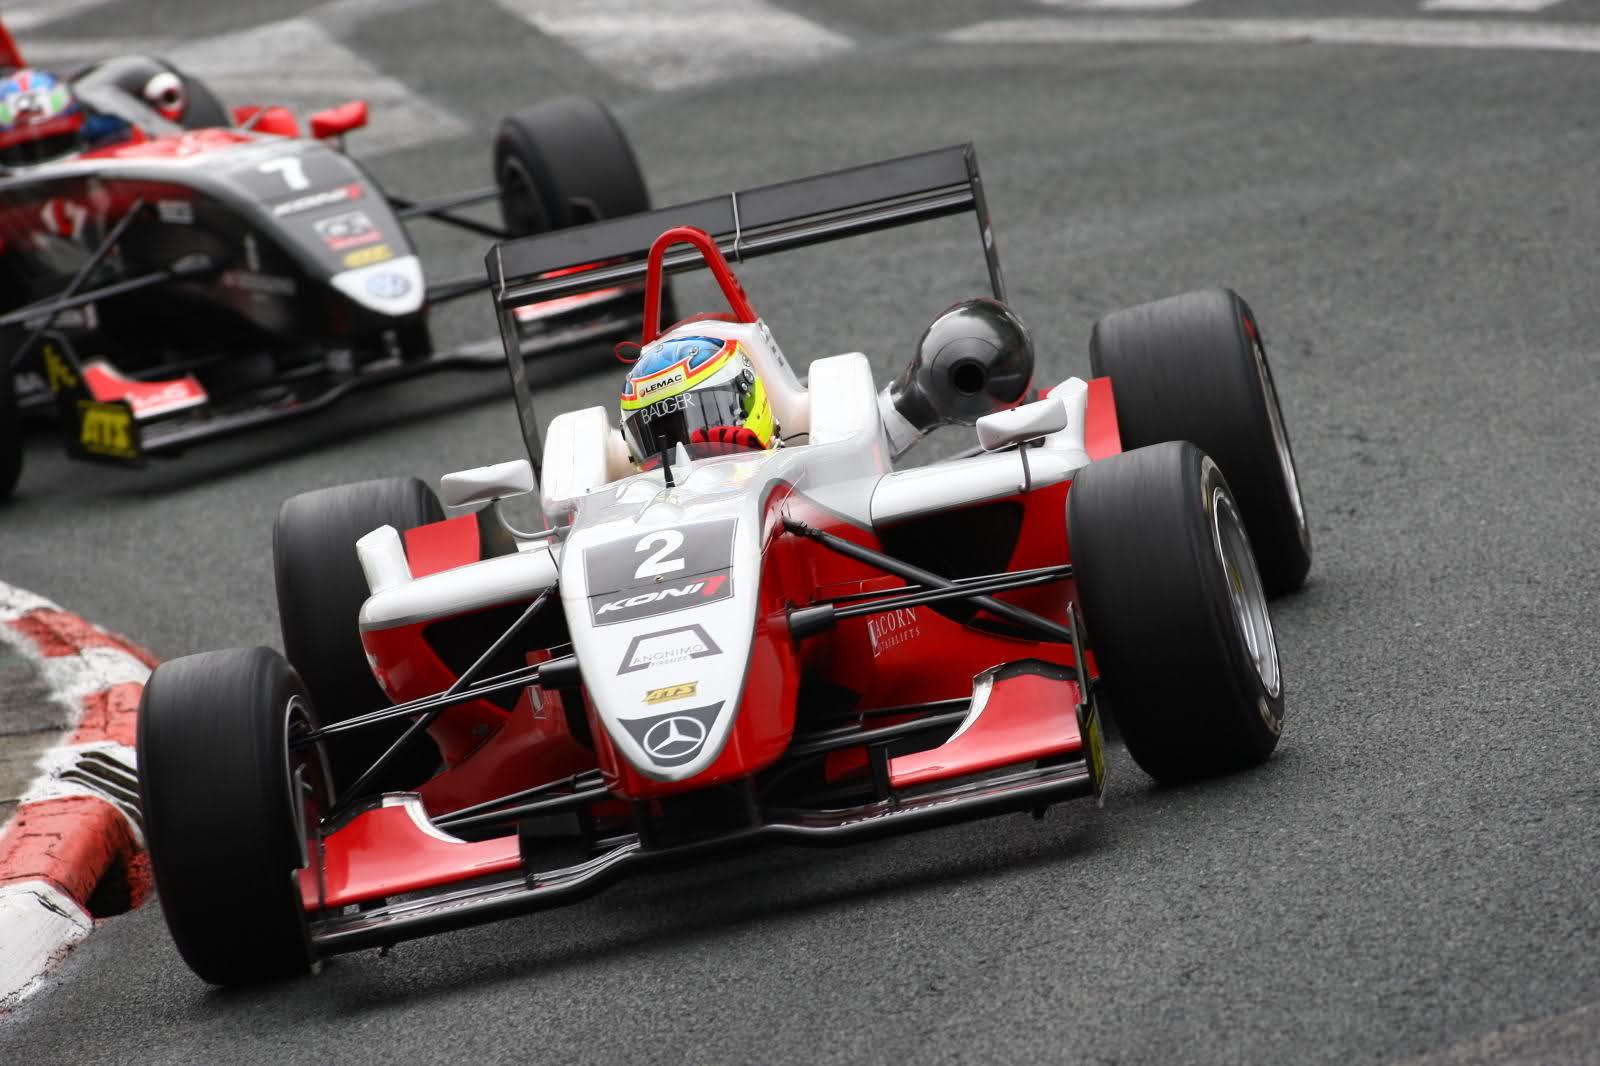 Dallara F306